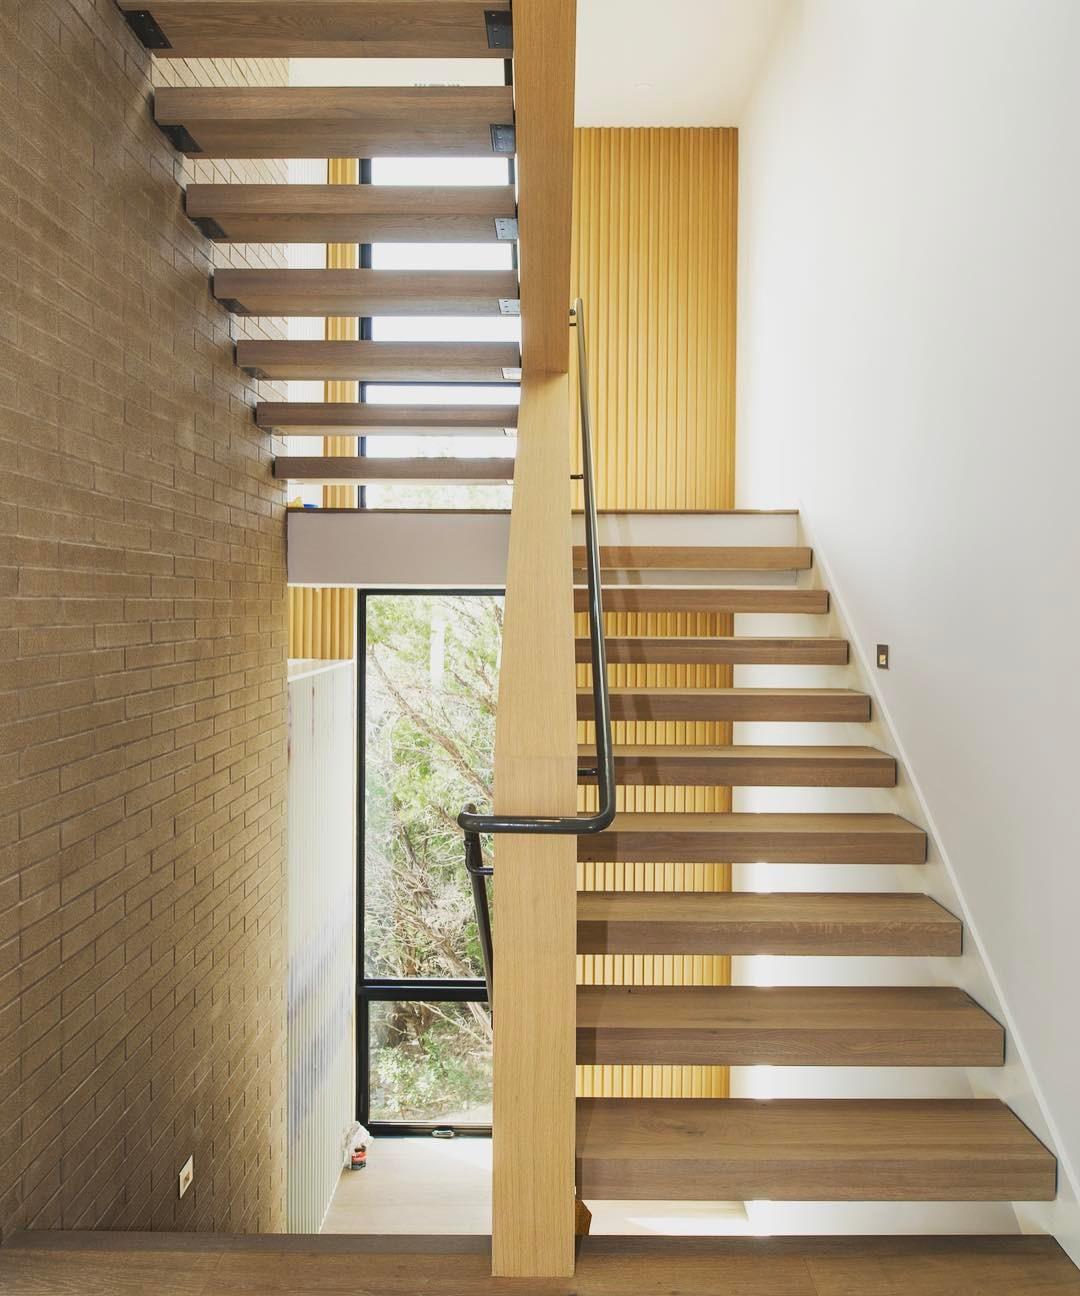 Floating white oak stair treads allow light to flow through this @foursquarebuilders home.